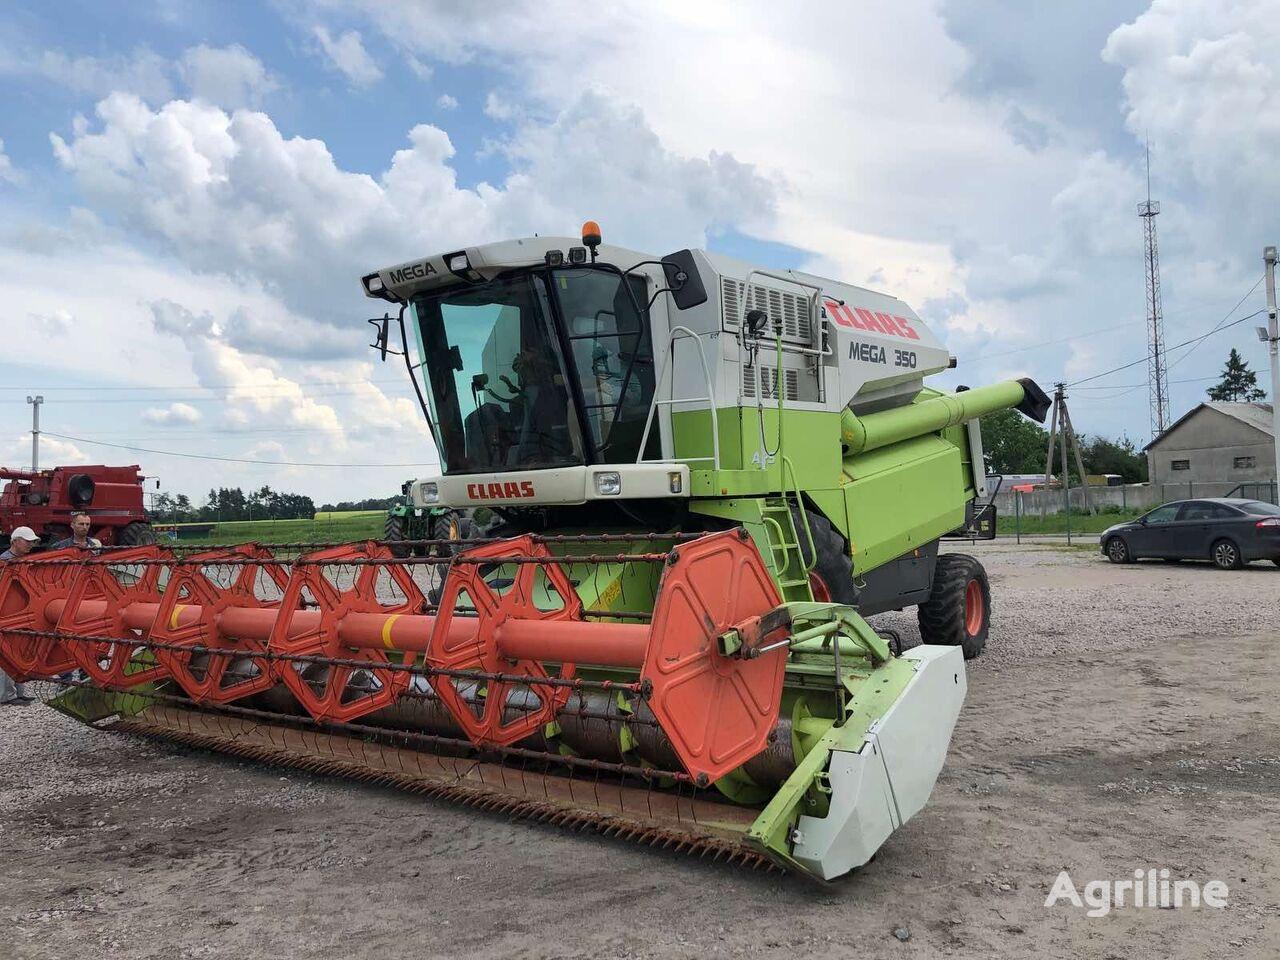 CLAAS Mega 350 v nayavnosti v Ukrayini combine-harvester